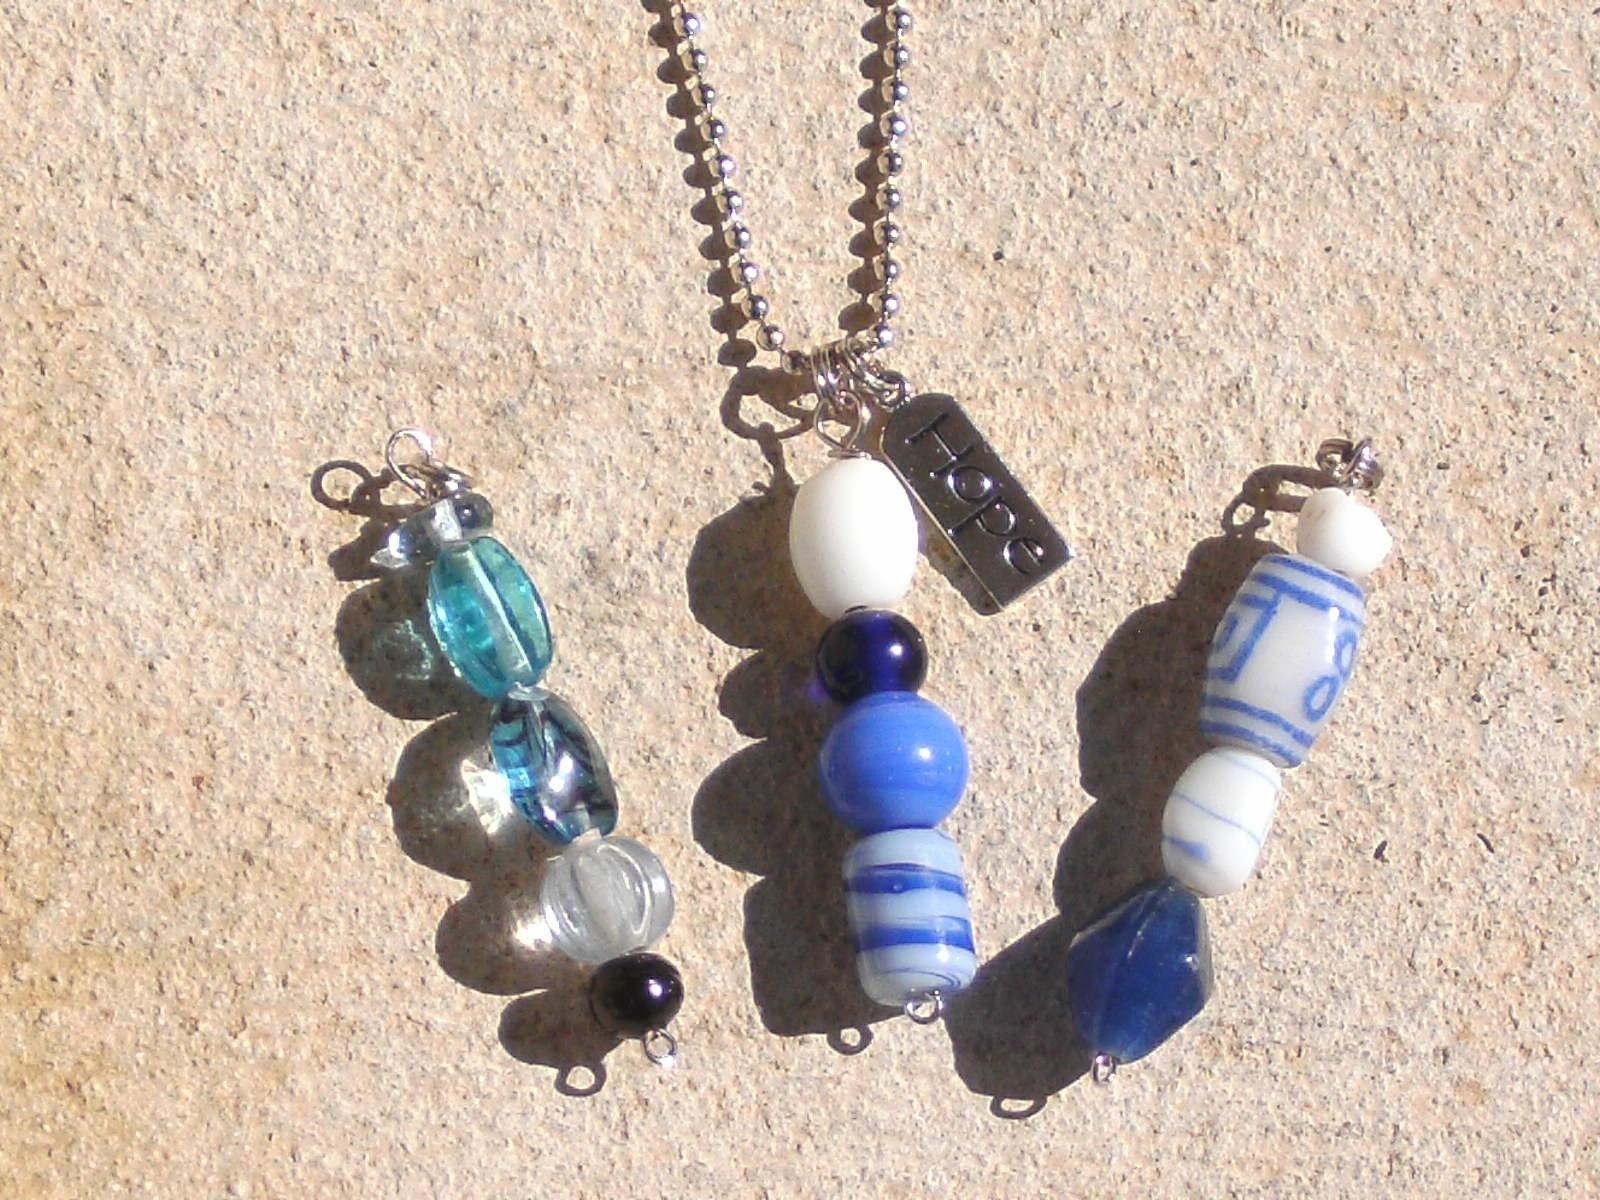 Blue Glass Bead Pendant set w/HOPE silver charm